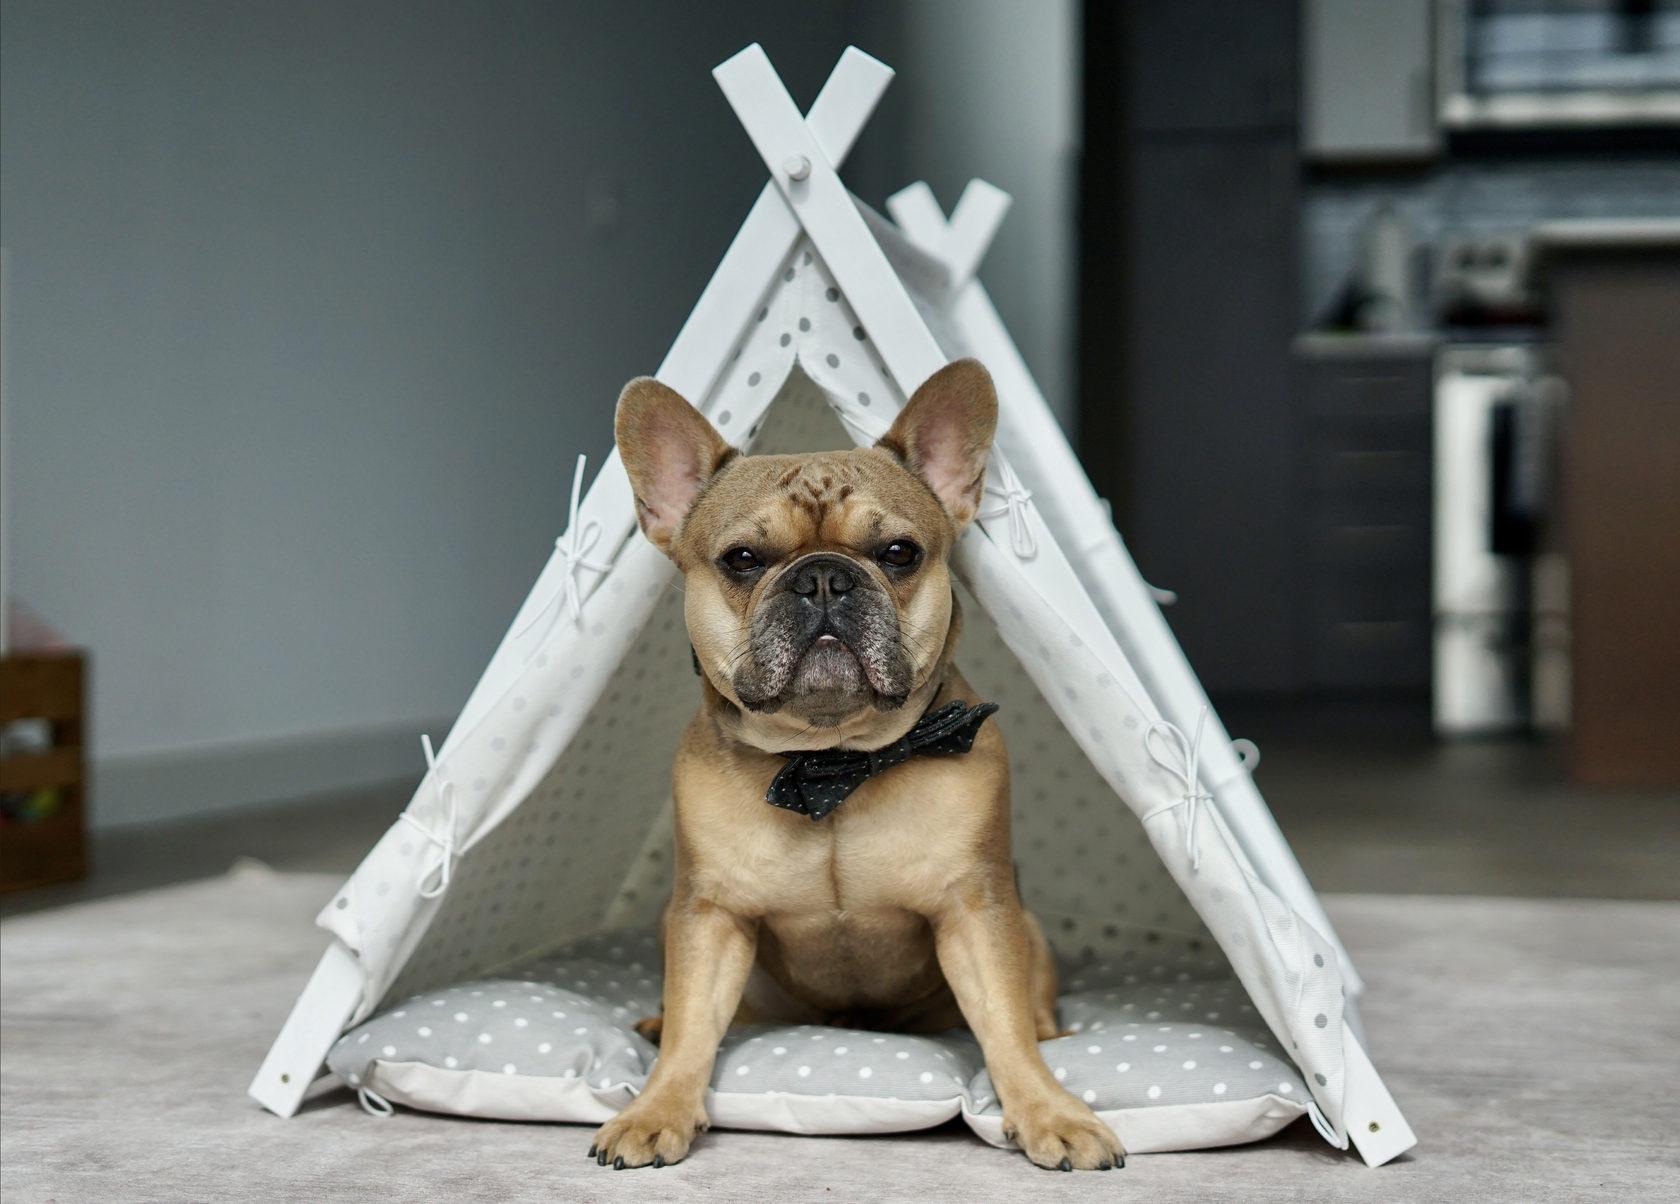 French Bulldog enjoying the Tee Pee lifestyle. Creative pet beds by DogAndTeepee.